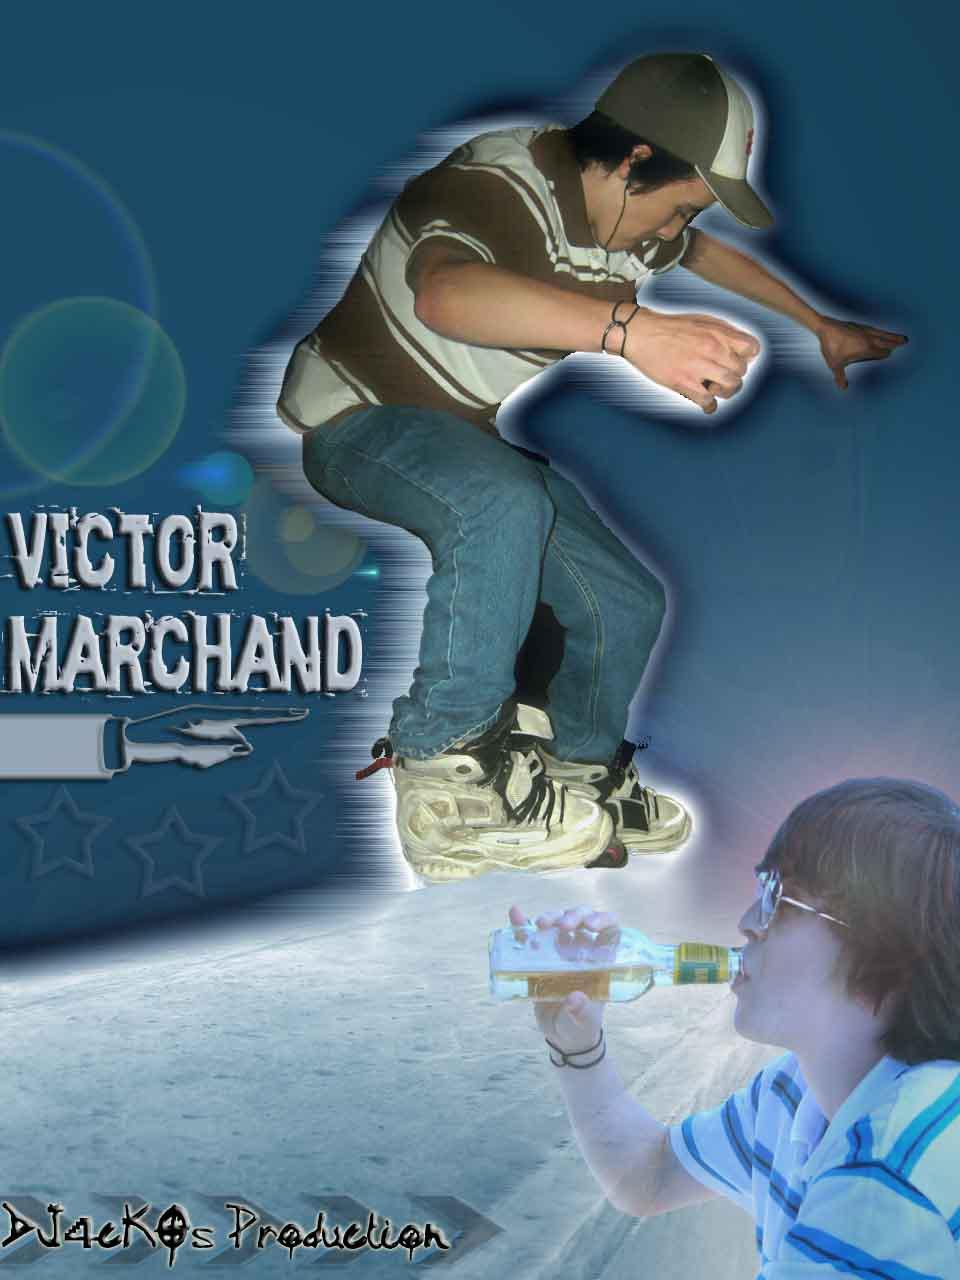 Thats my friend Vic